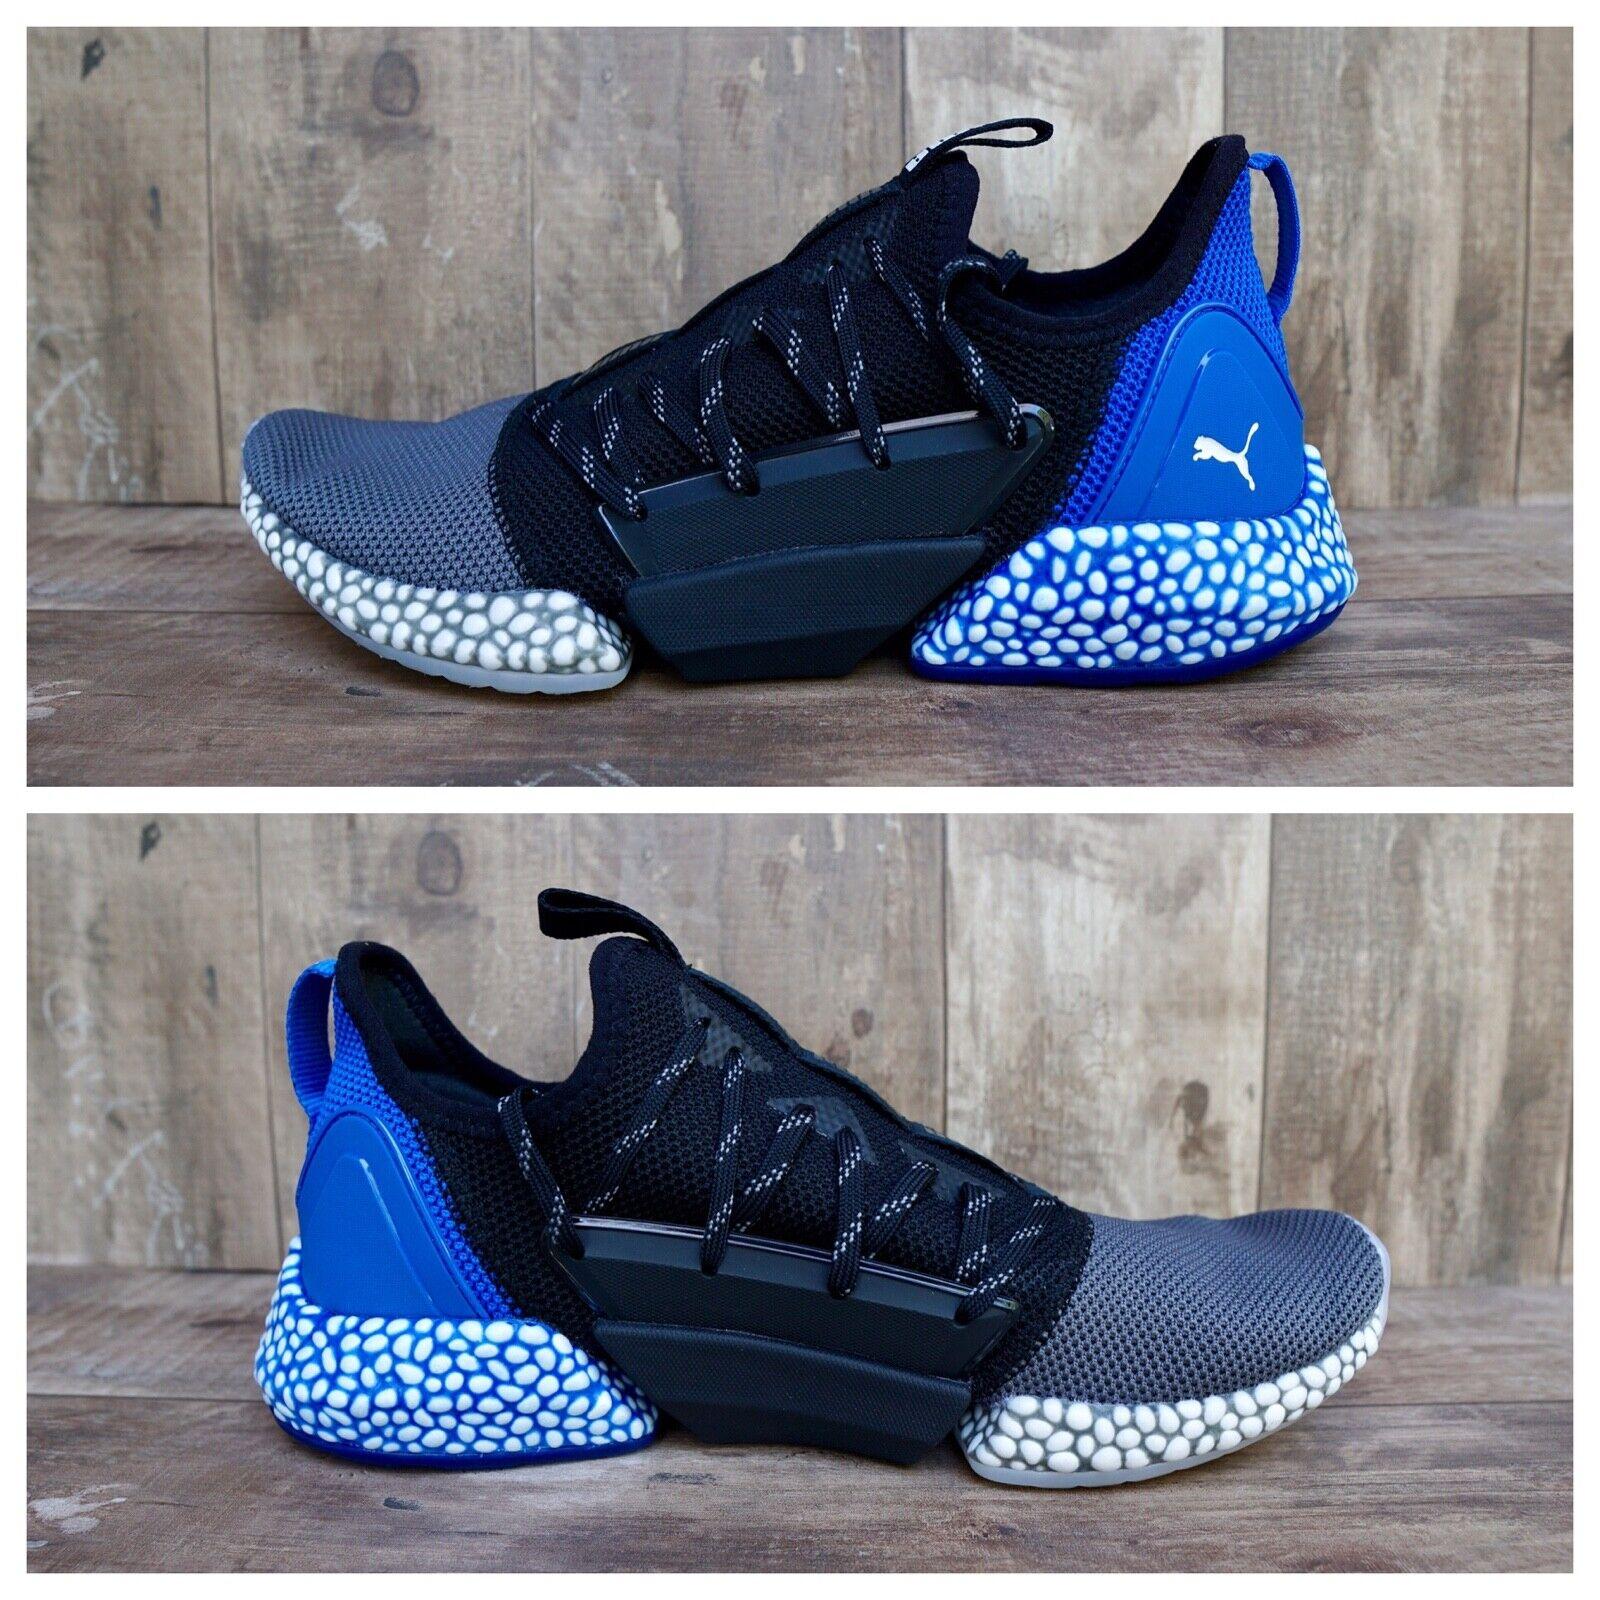 Puma Hybrid Rocket Runners Men's Size 9.5 & 10.5 Black bluee Running shoes